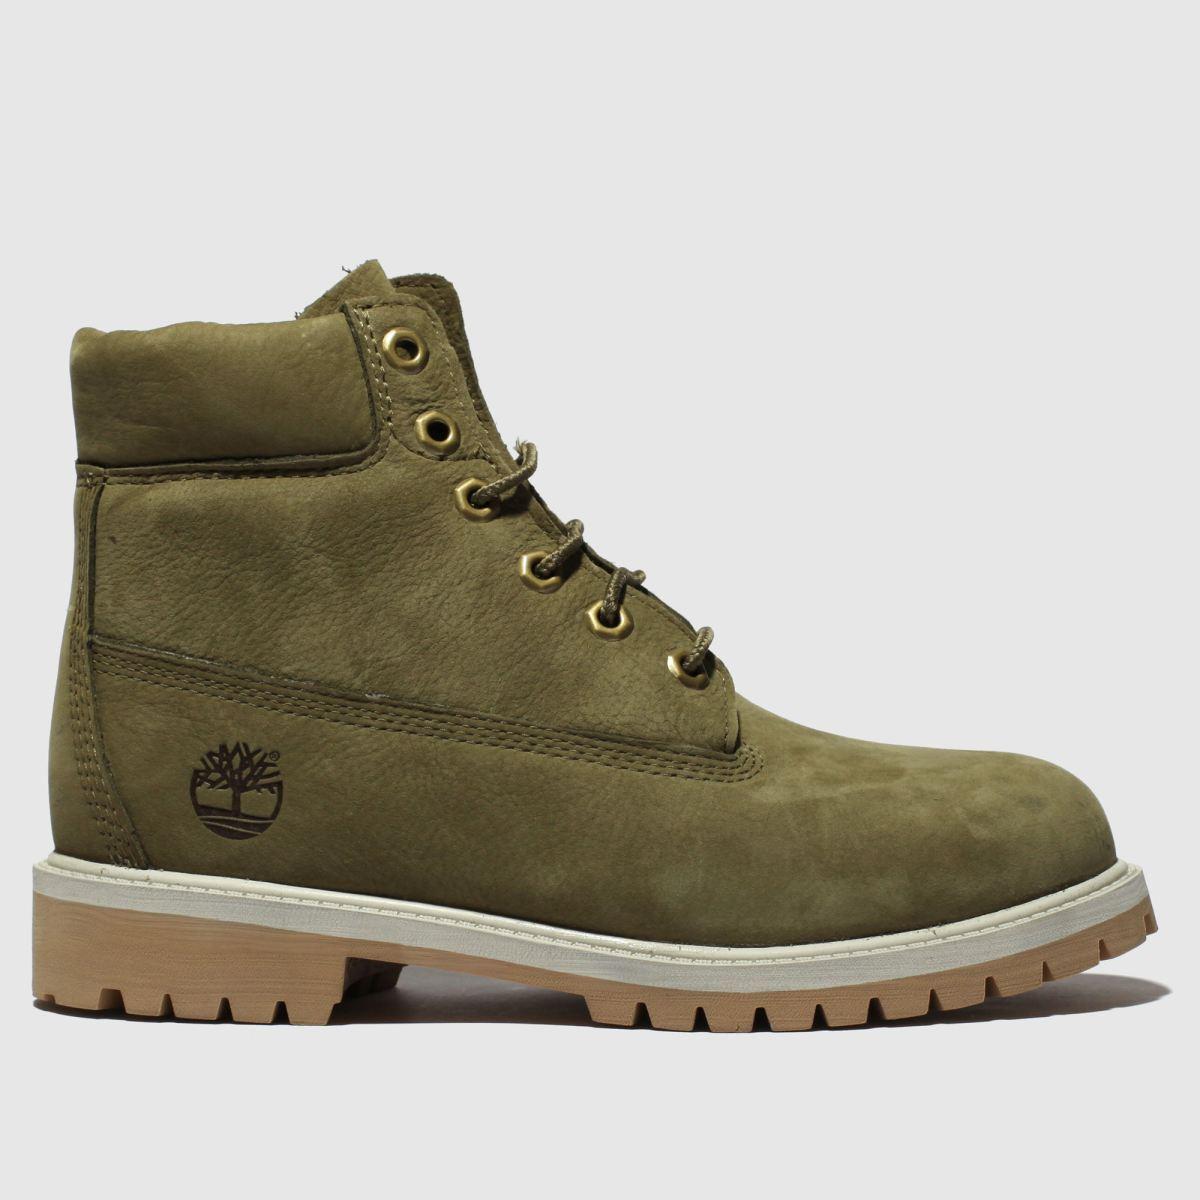 Timberland Khaki Inch Premium Boots Youth